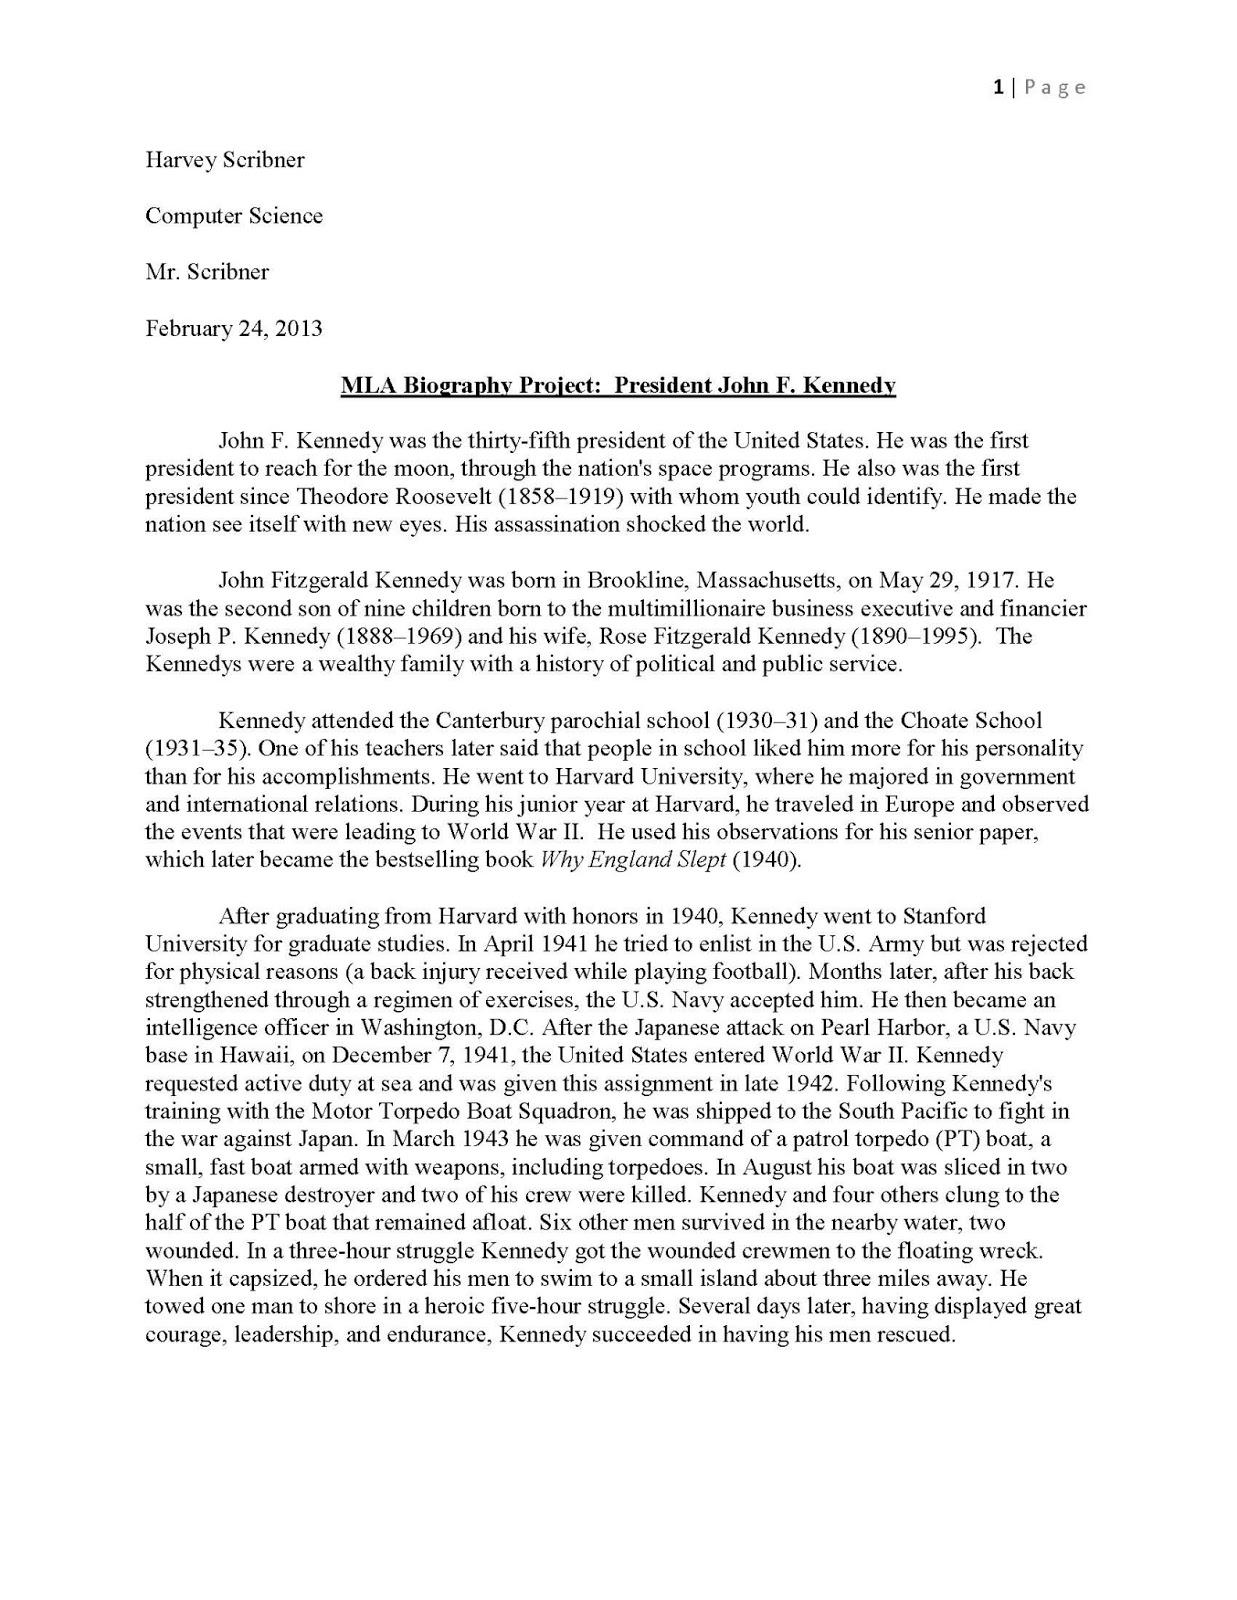 007 Essay Example Biography Jfkmlashortformbiographyreportexample Page 1 Impressive Conclusion Examples College Titles Full